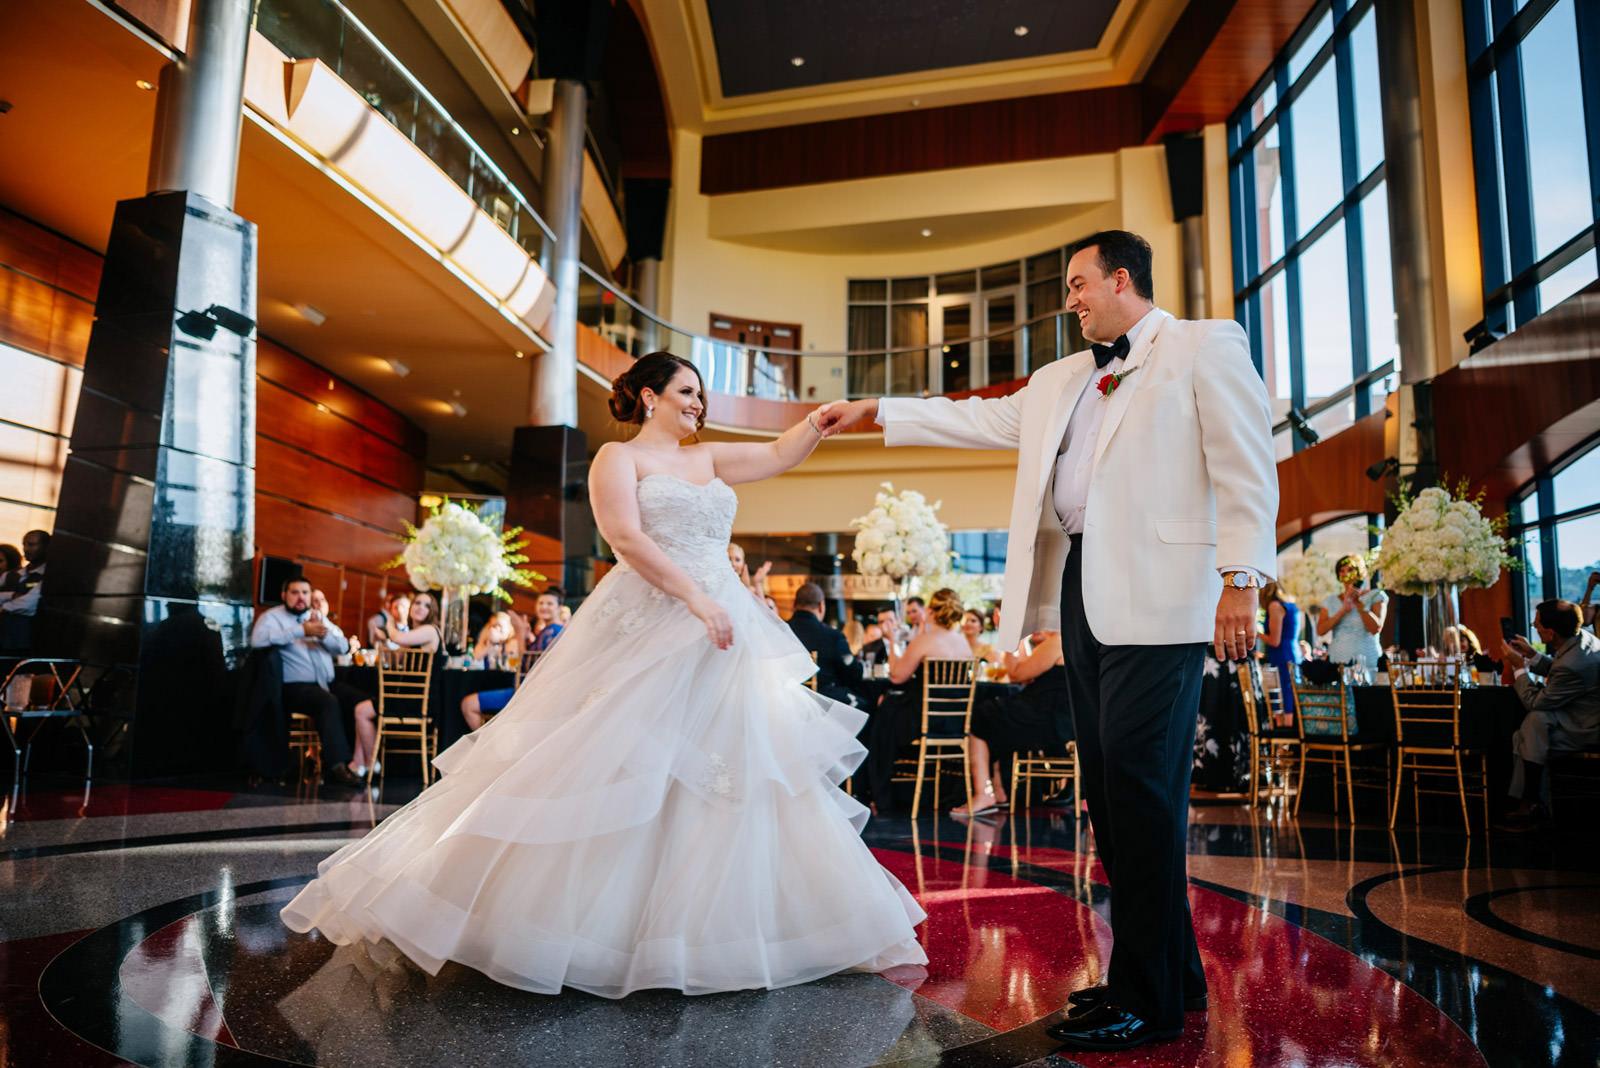 clay center wedding reception first dance